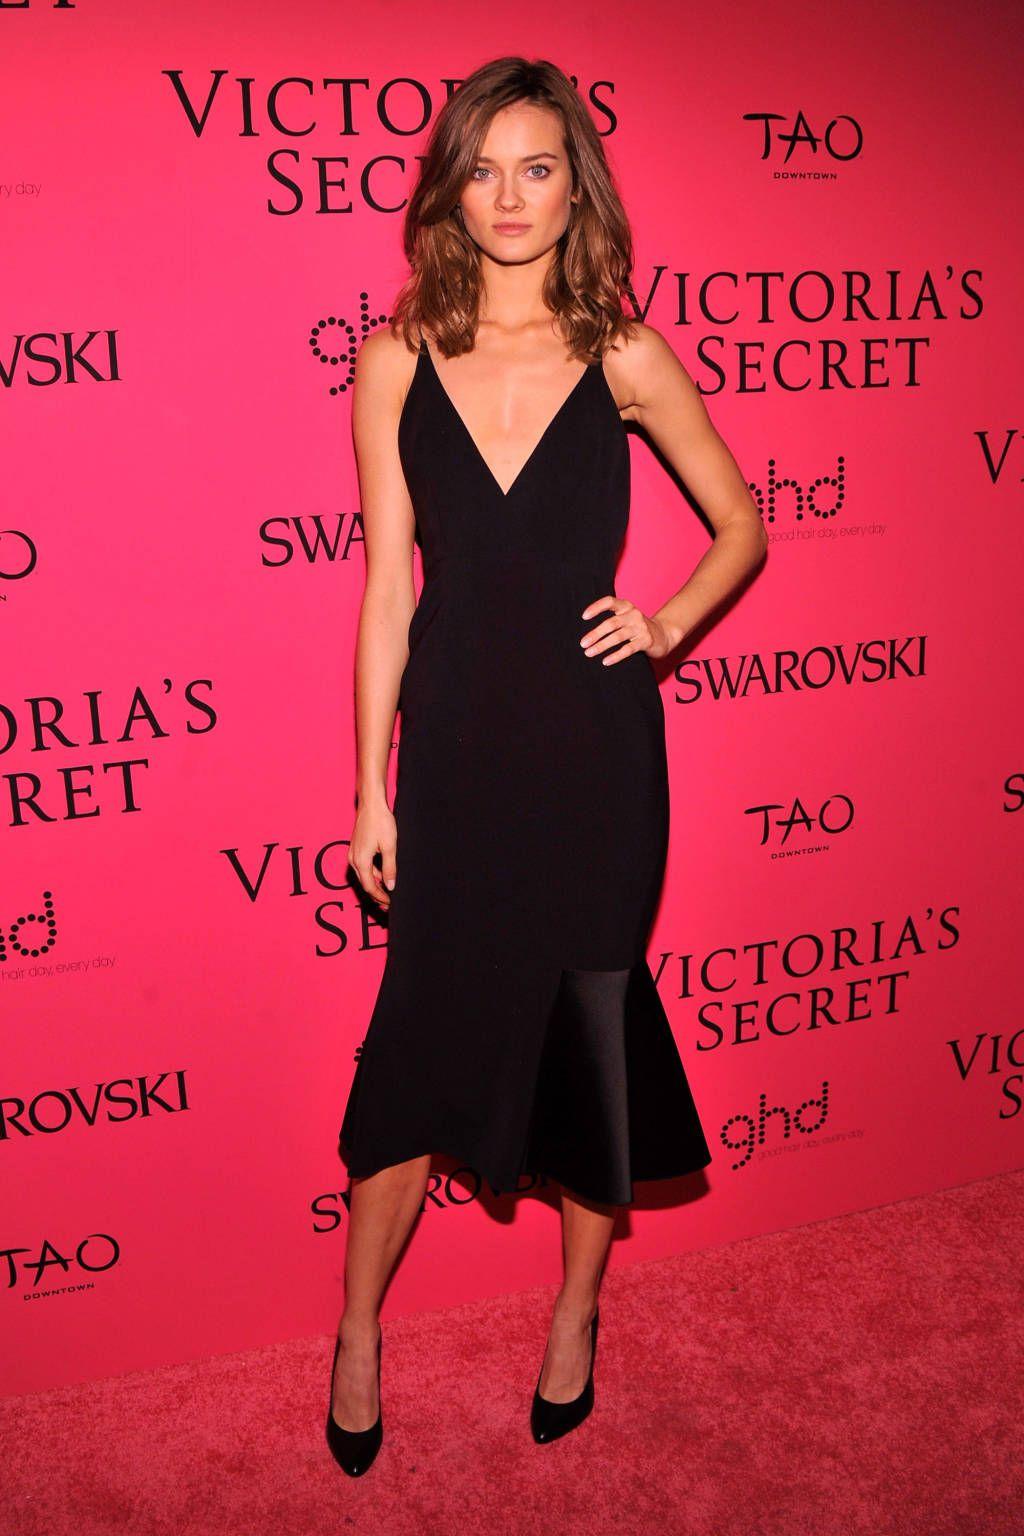 , The Victoria's Secret Fashion Show Afterparty, Anja Rubik Blog, Anja Rubik Blog